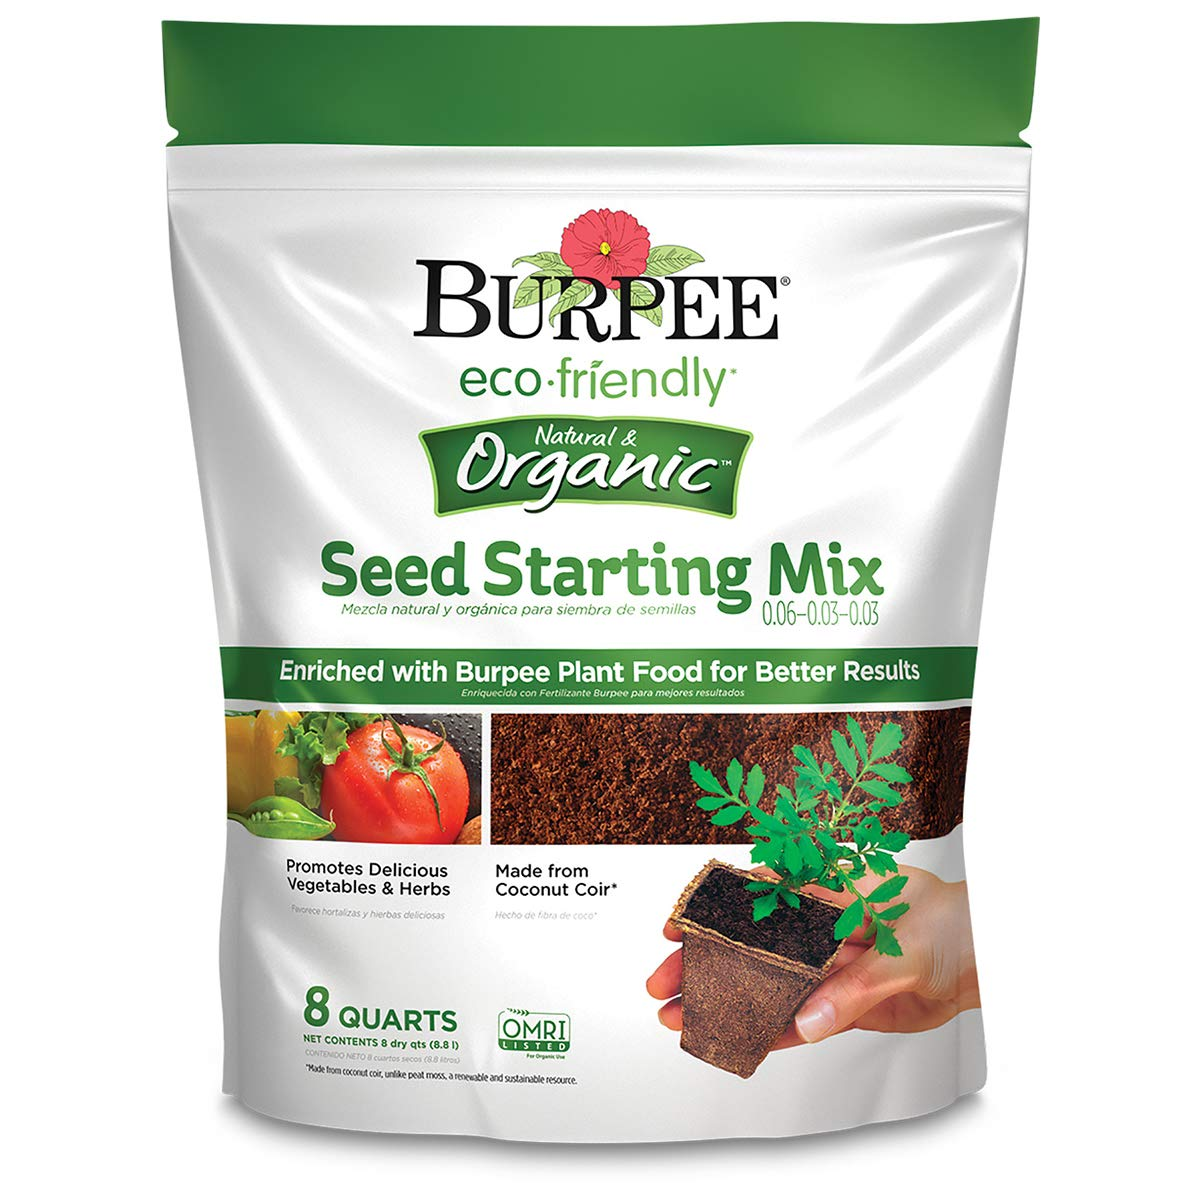 Burpee Seed Starting Mix